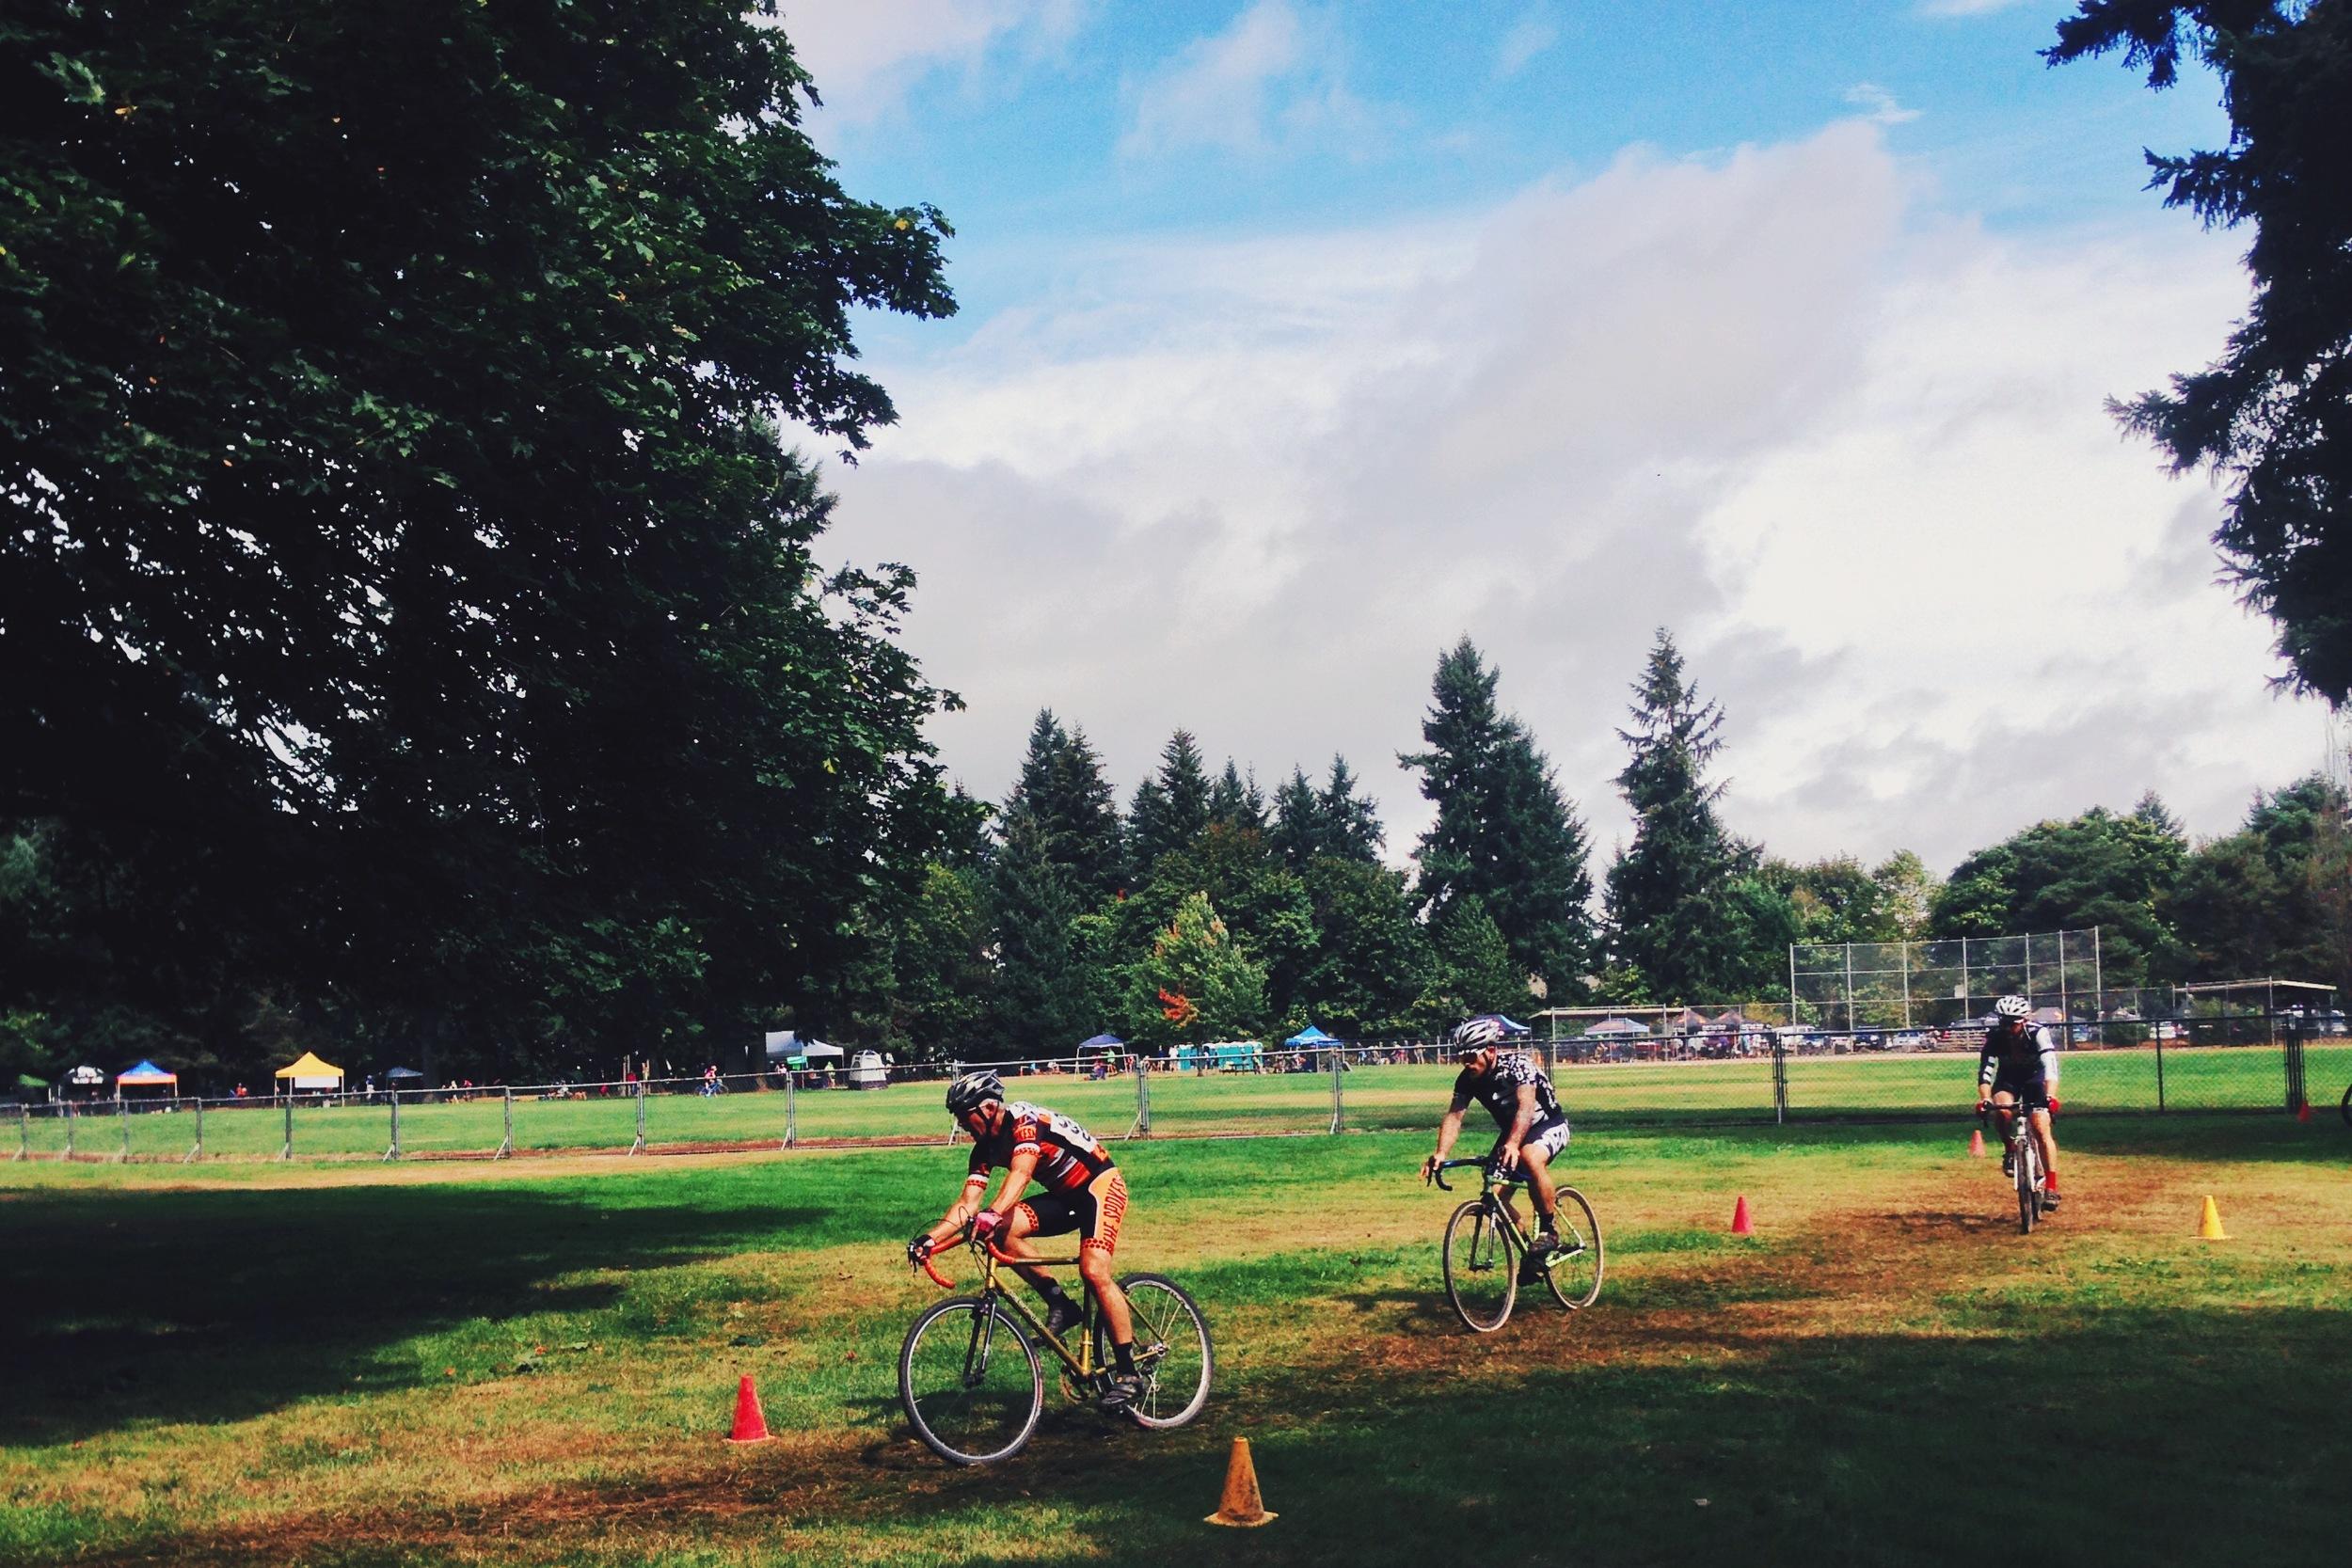 Grand Prix Ryan Tonkin race #1 at David Douglas Park in Vancouver, WA